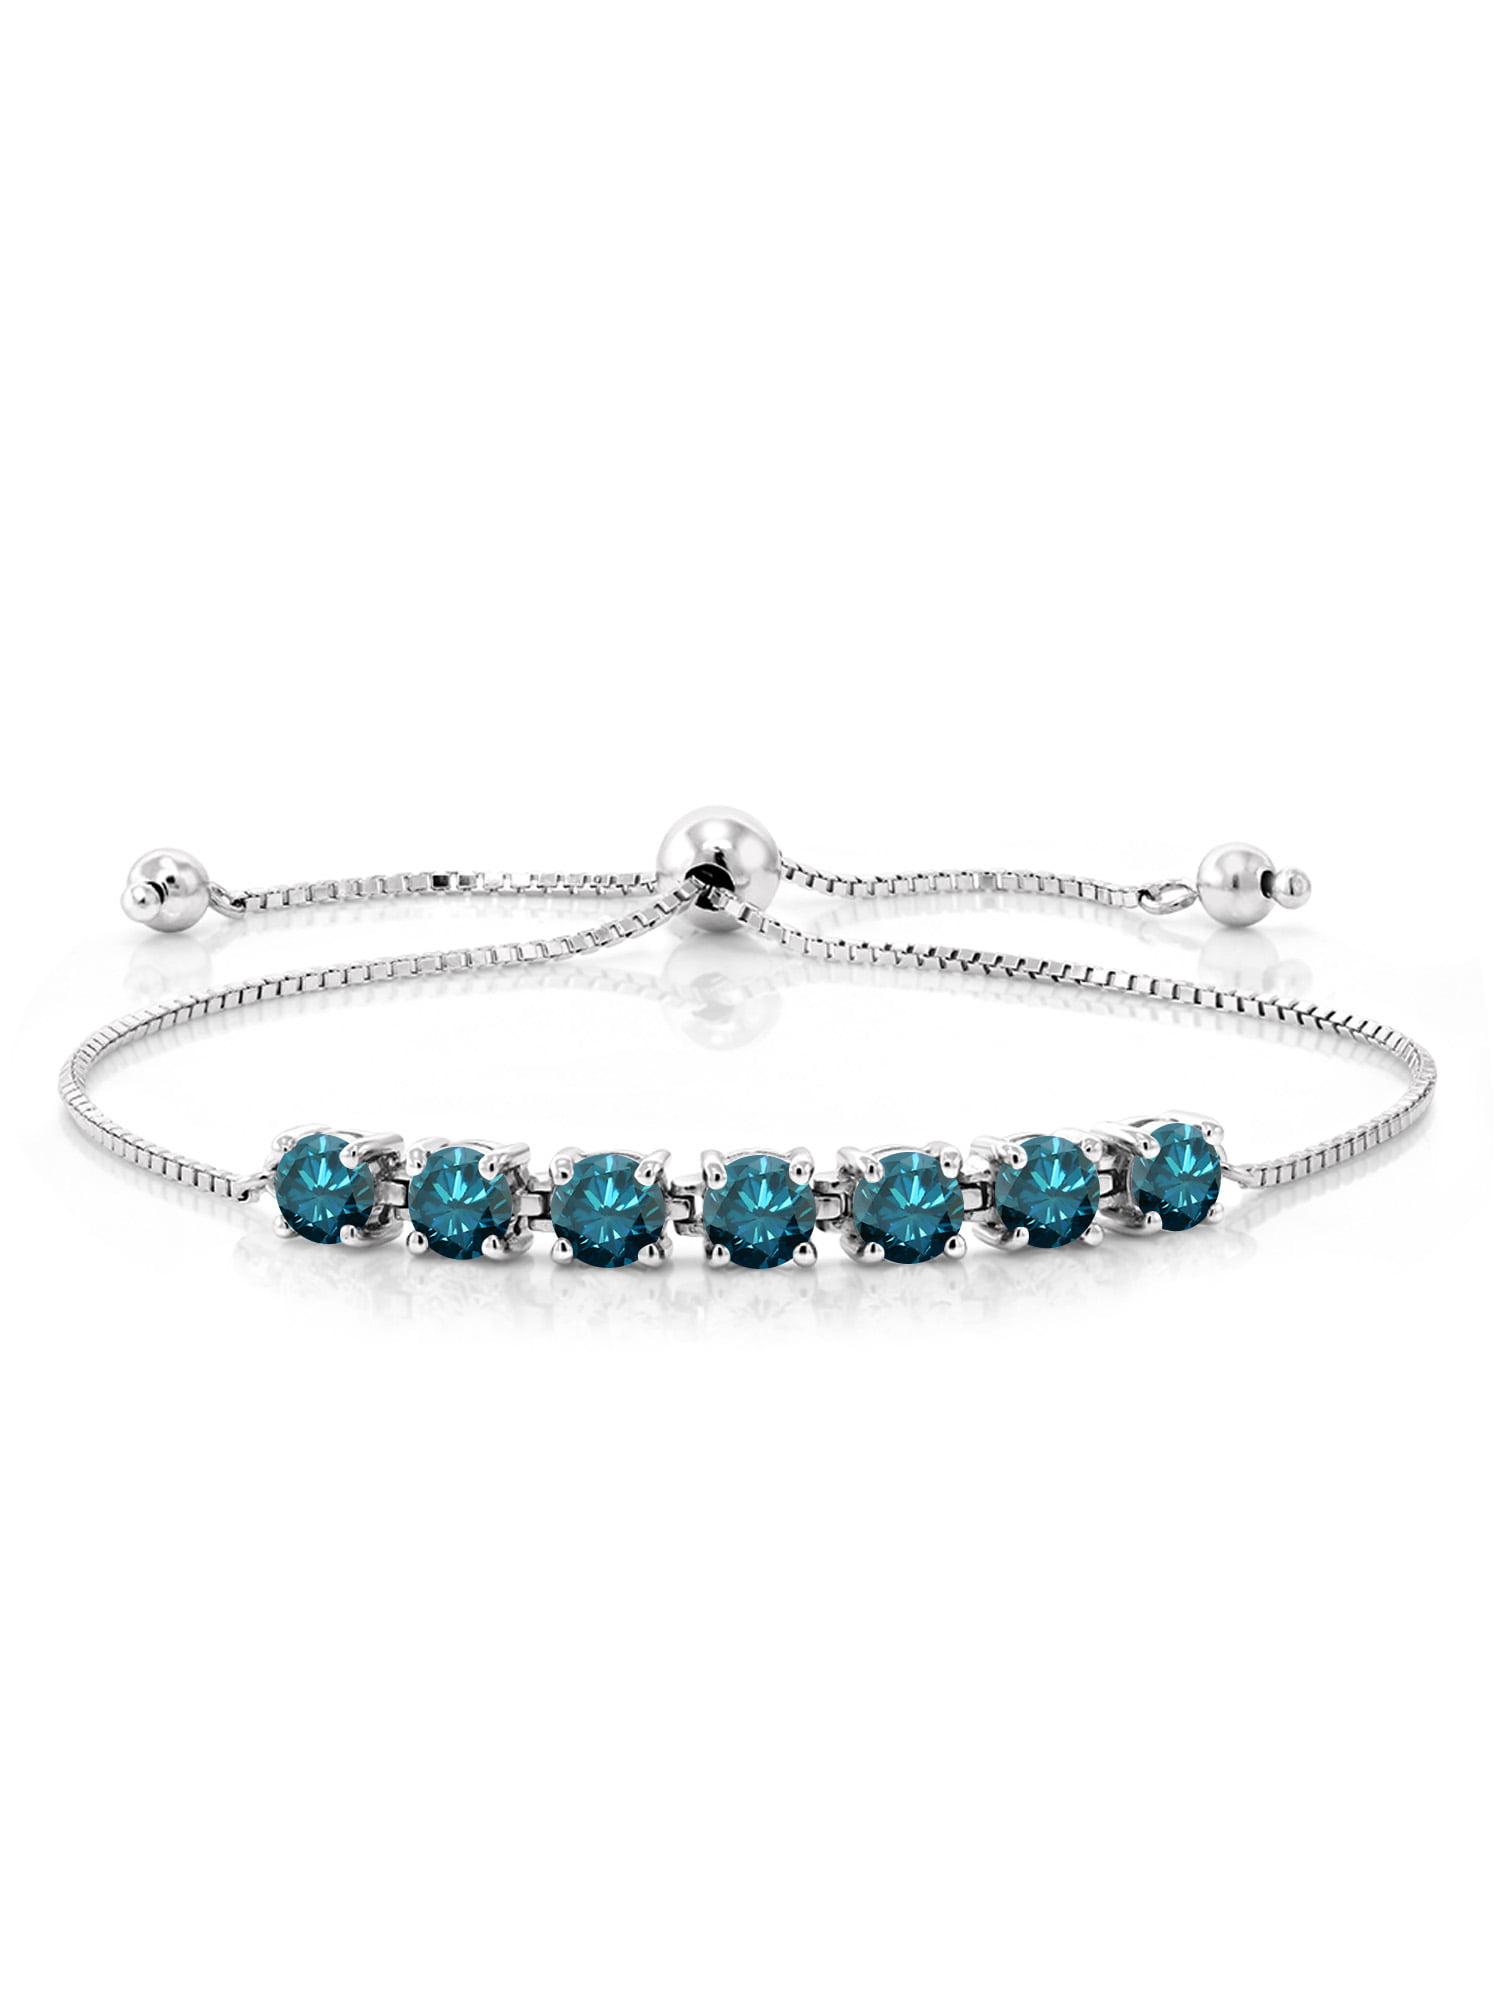 2.59 Ct Round Blue Diamond 925 Sterling Silver Bracelet by